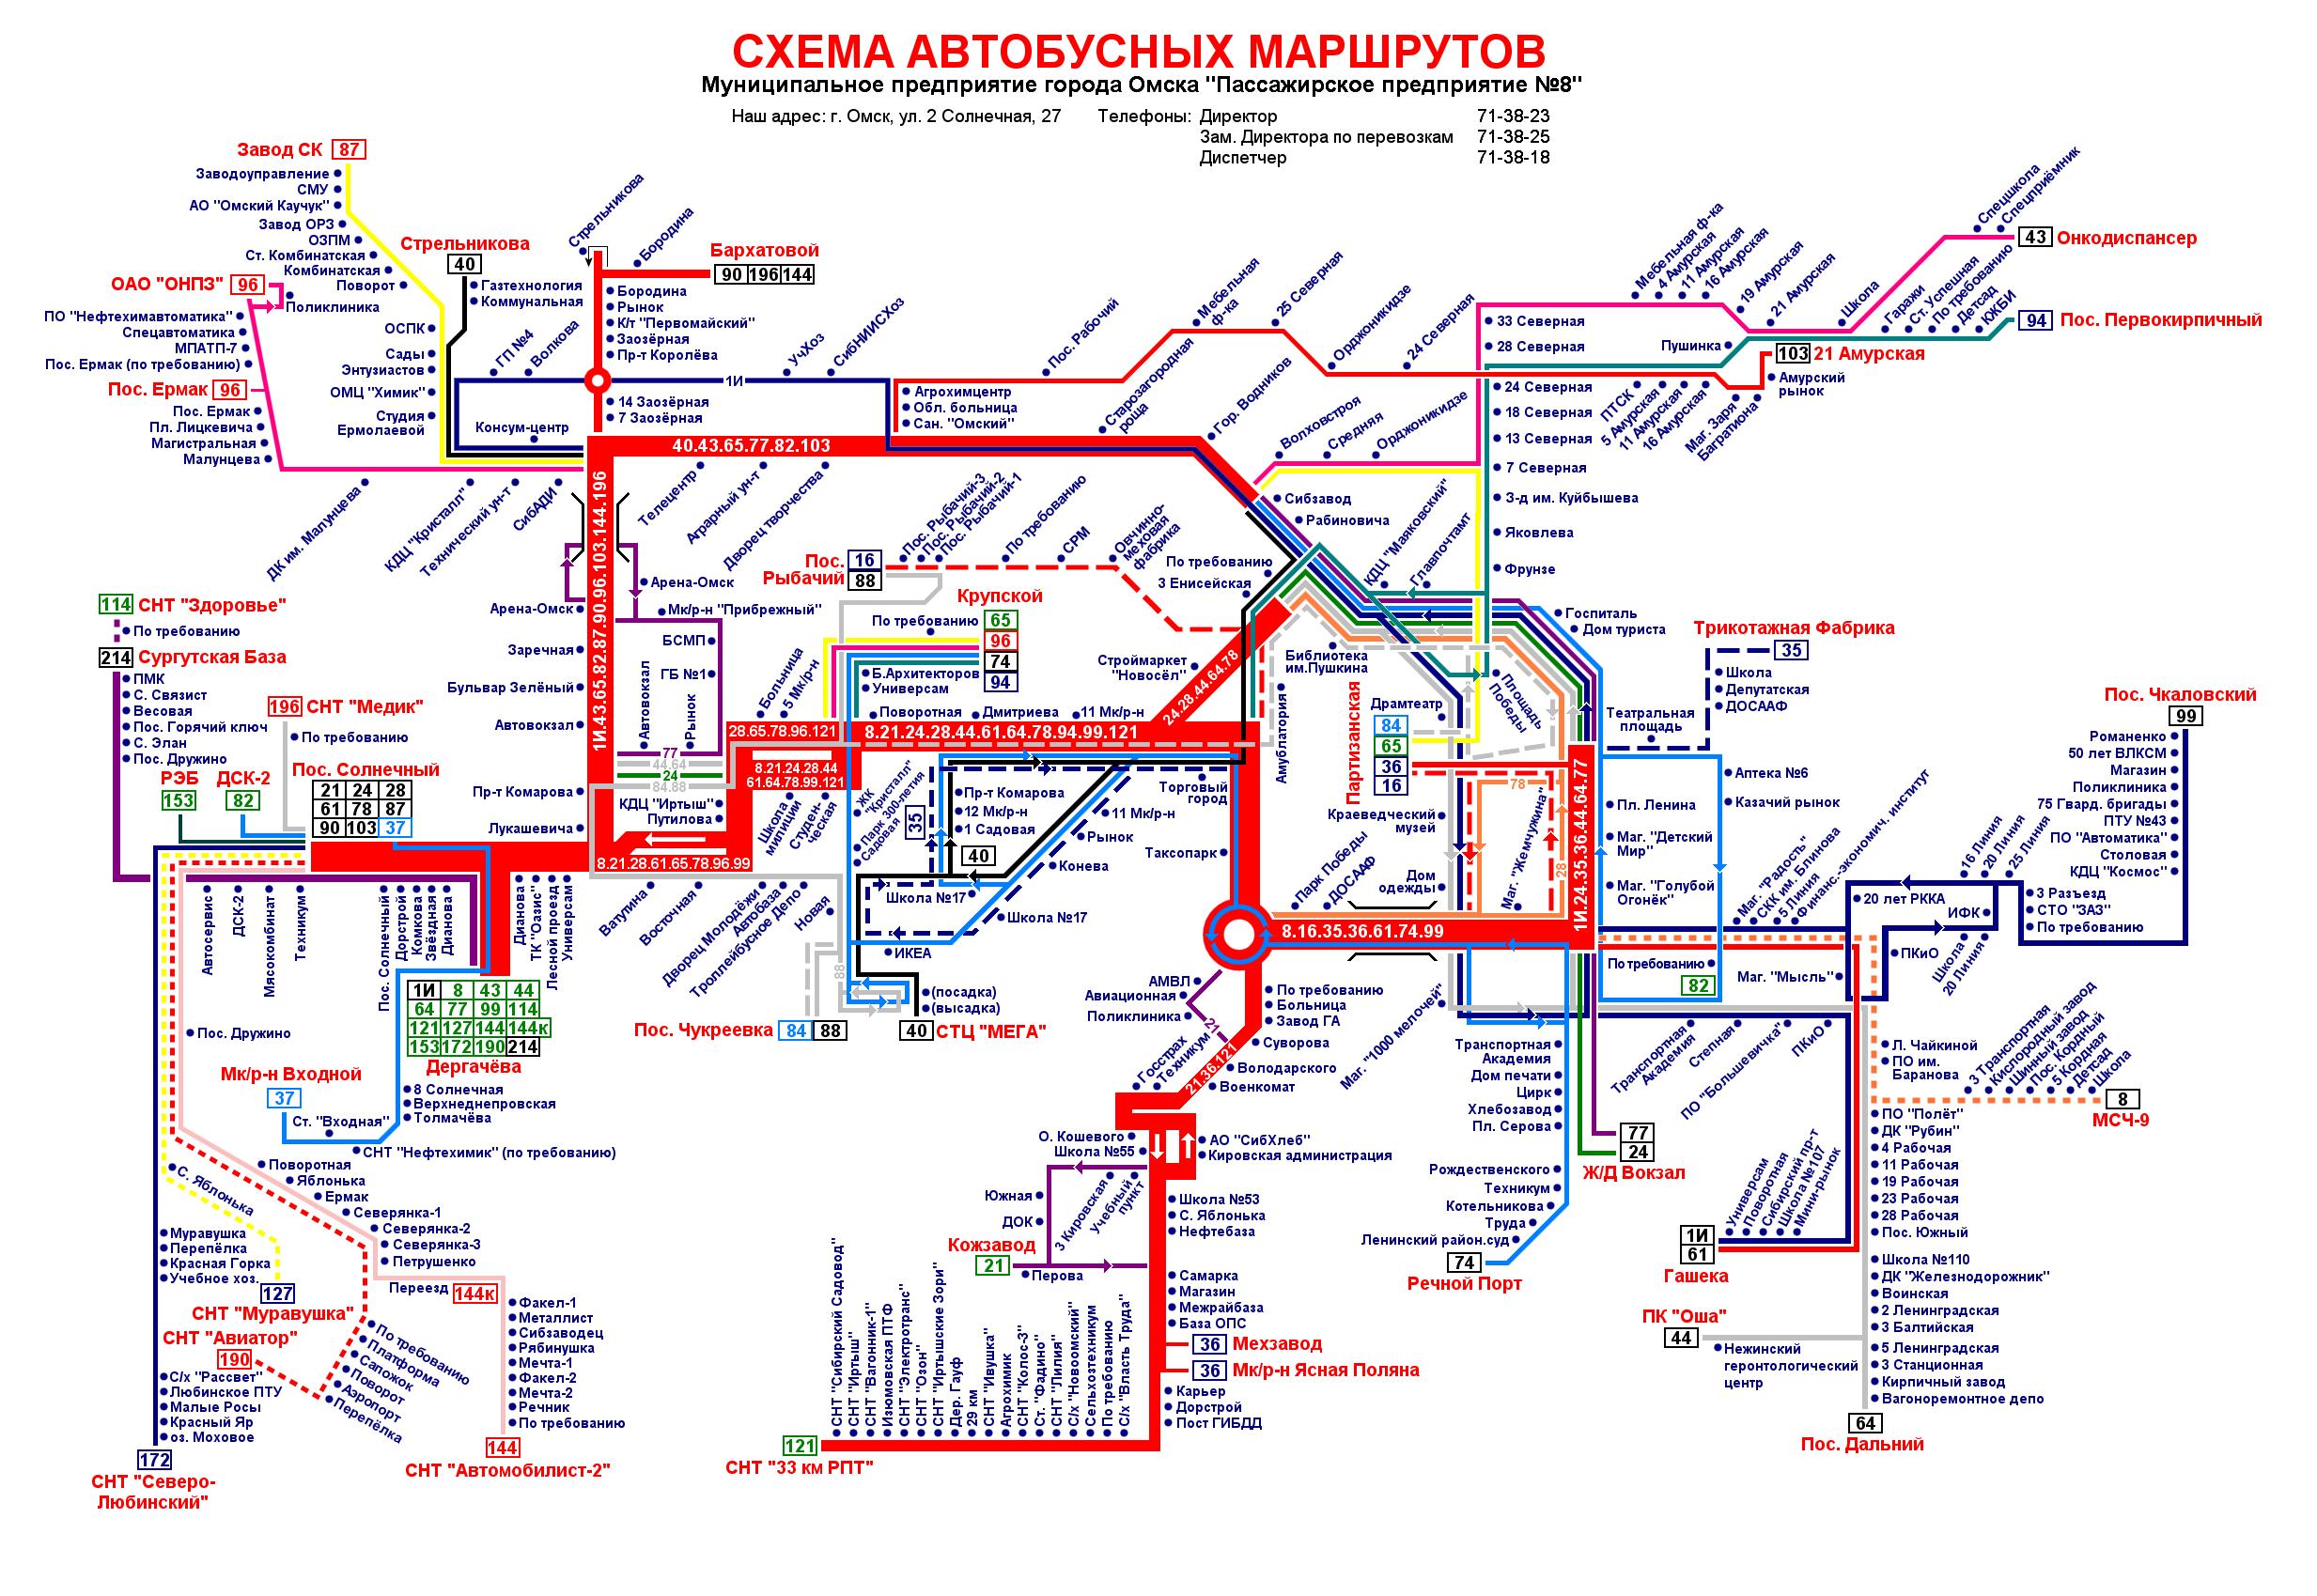 Omsk region — Maps